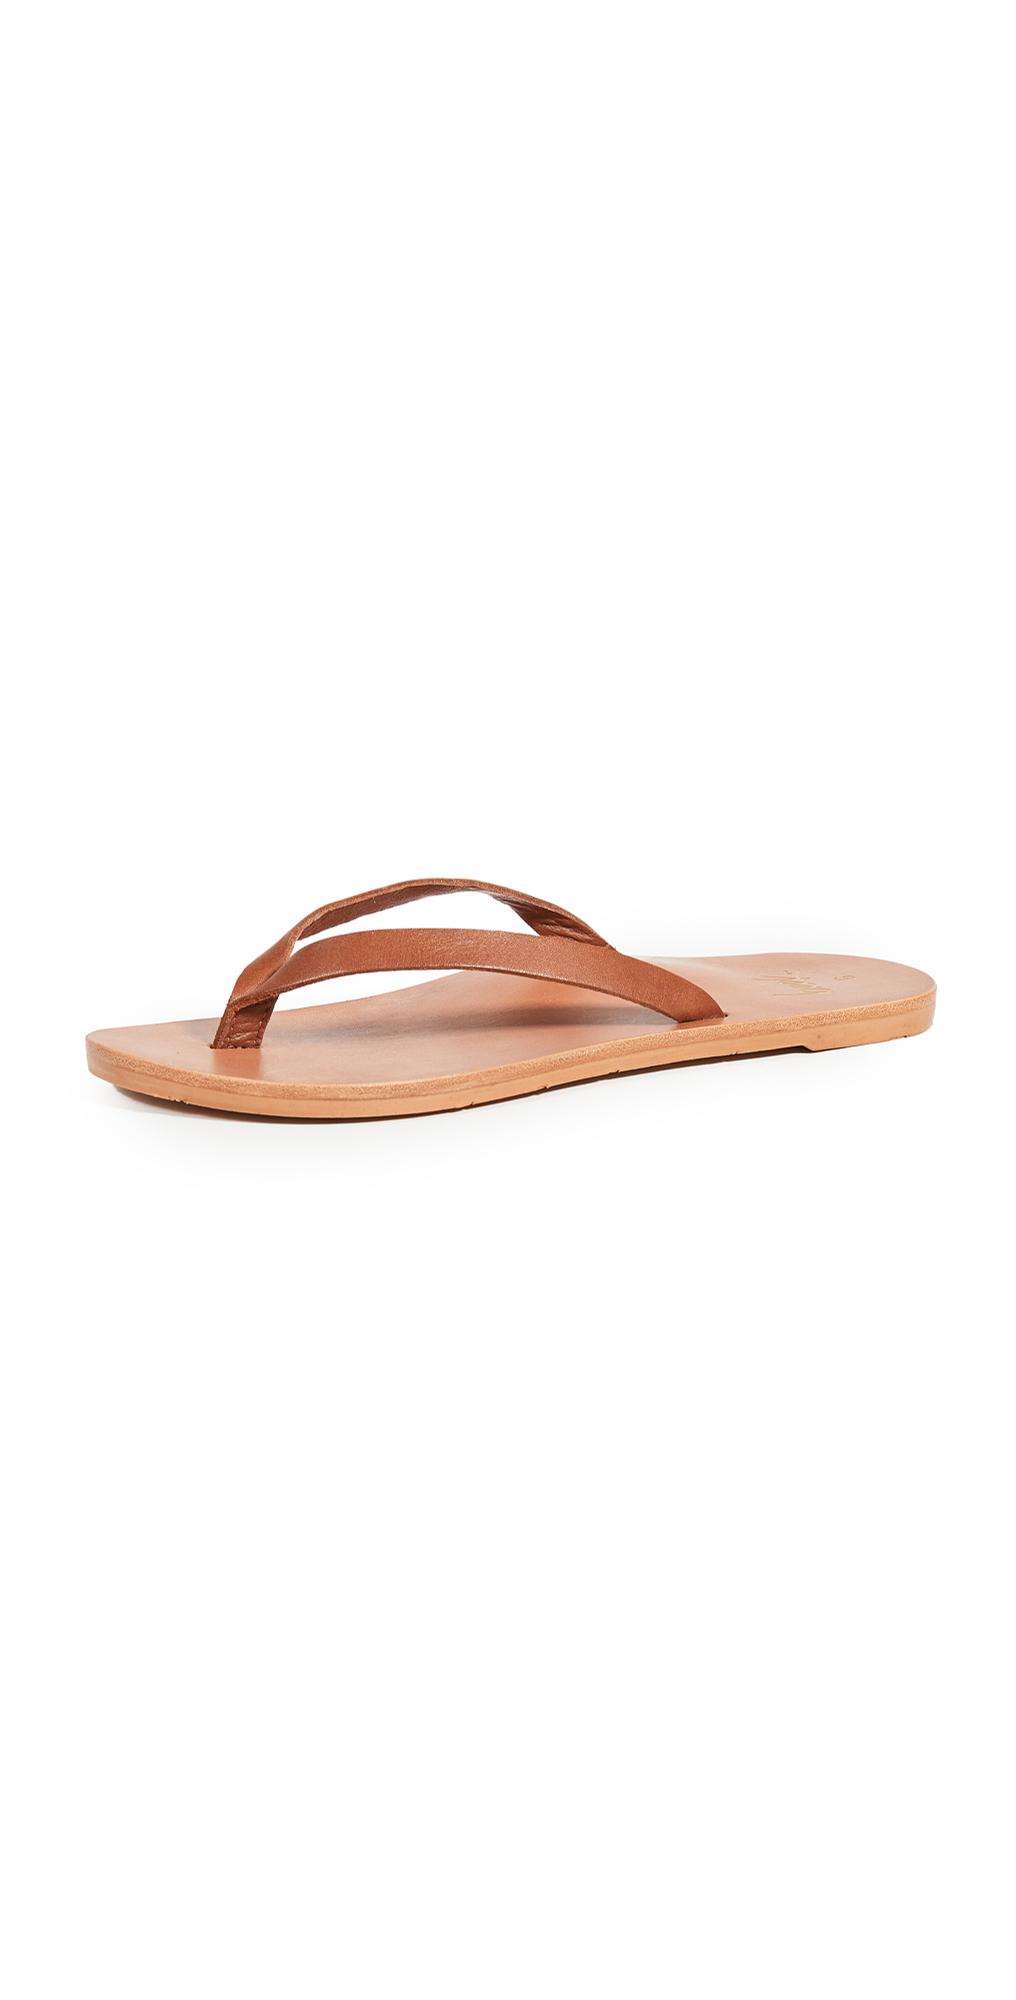 Seabird Flip Flops